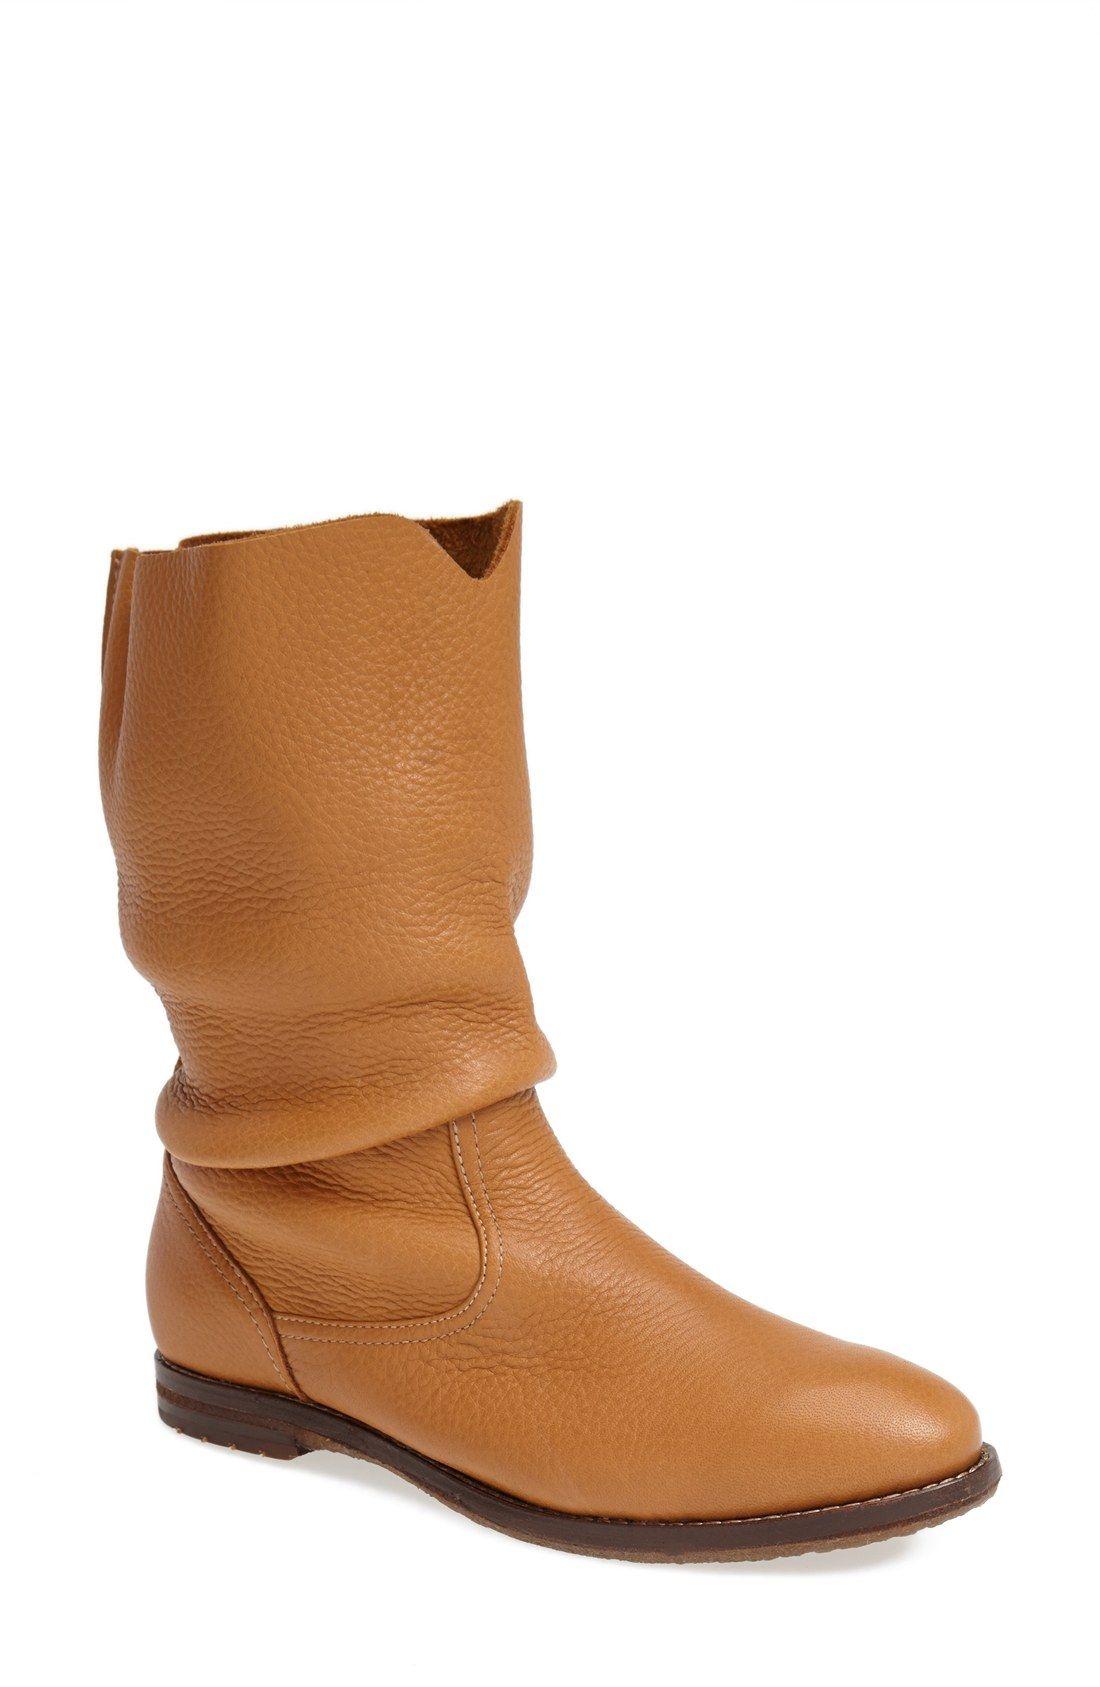 Trask 'Ava' Boot 328